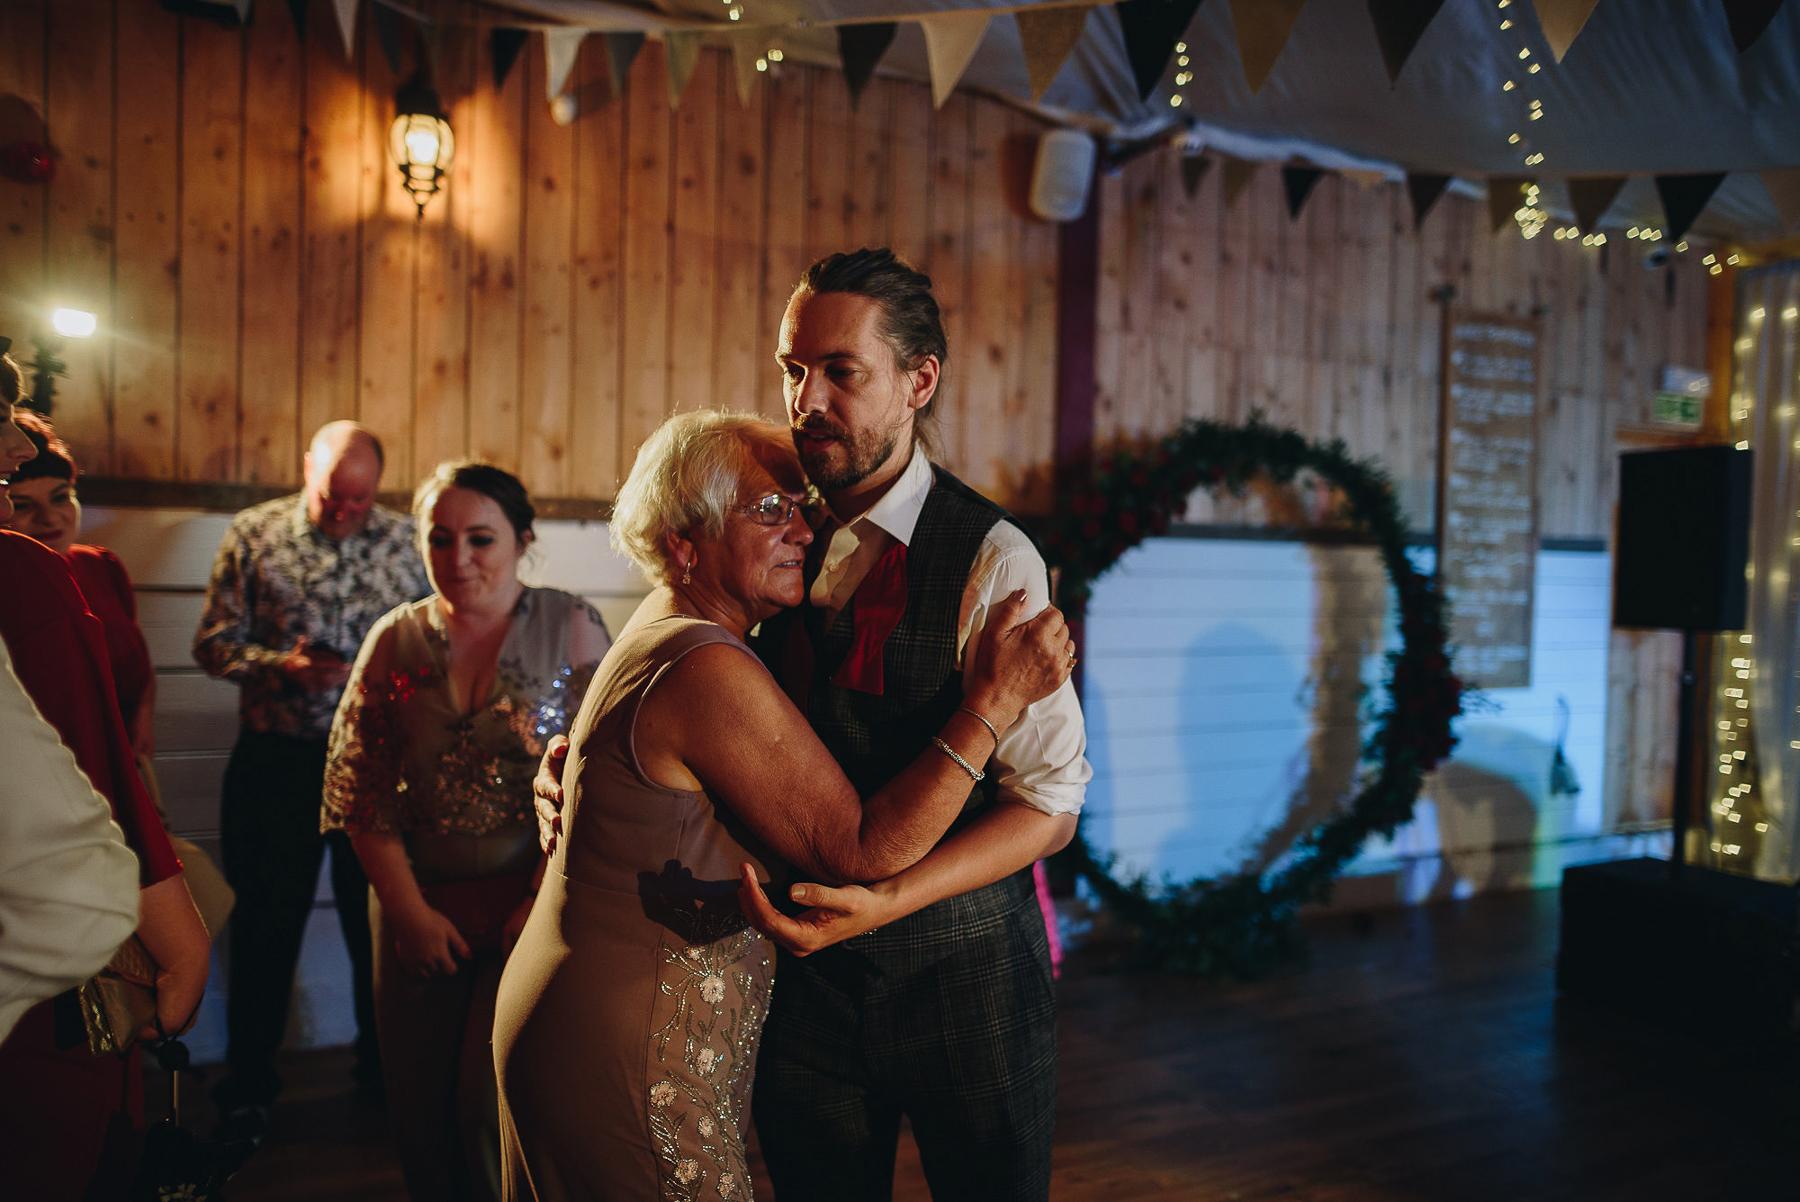 Wellbeing_Farm_Wedding_Photography_The_Pin-Up_Bride_Lara_Shaun-147.jpg